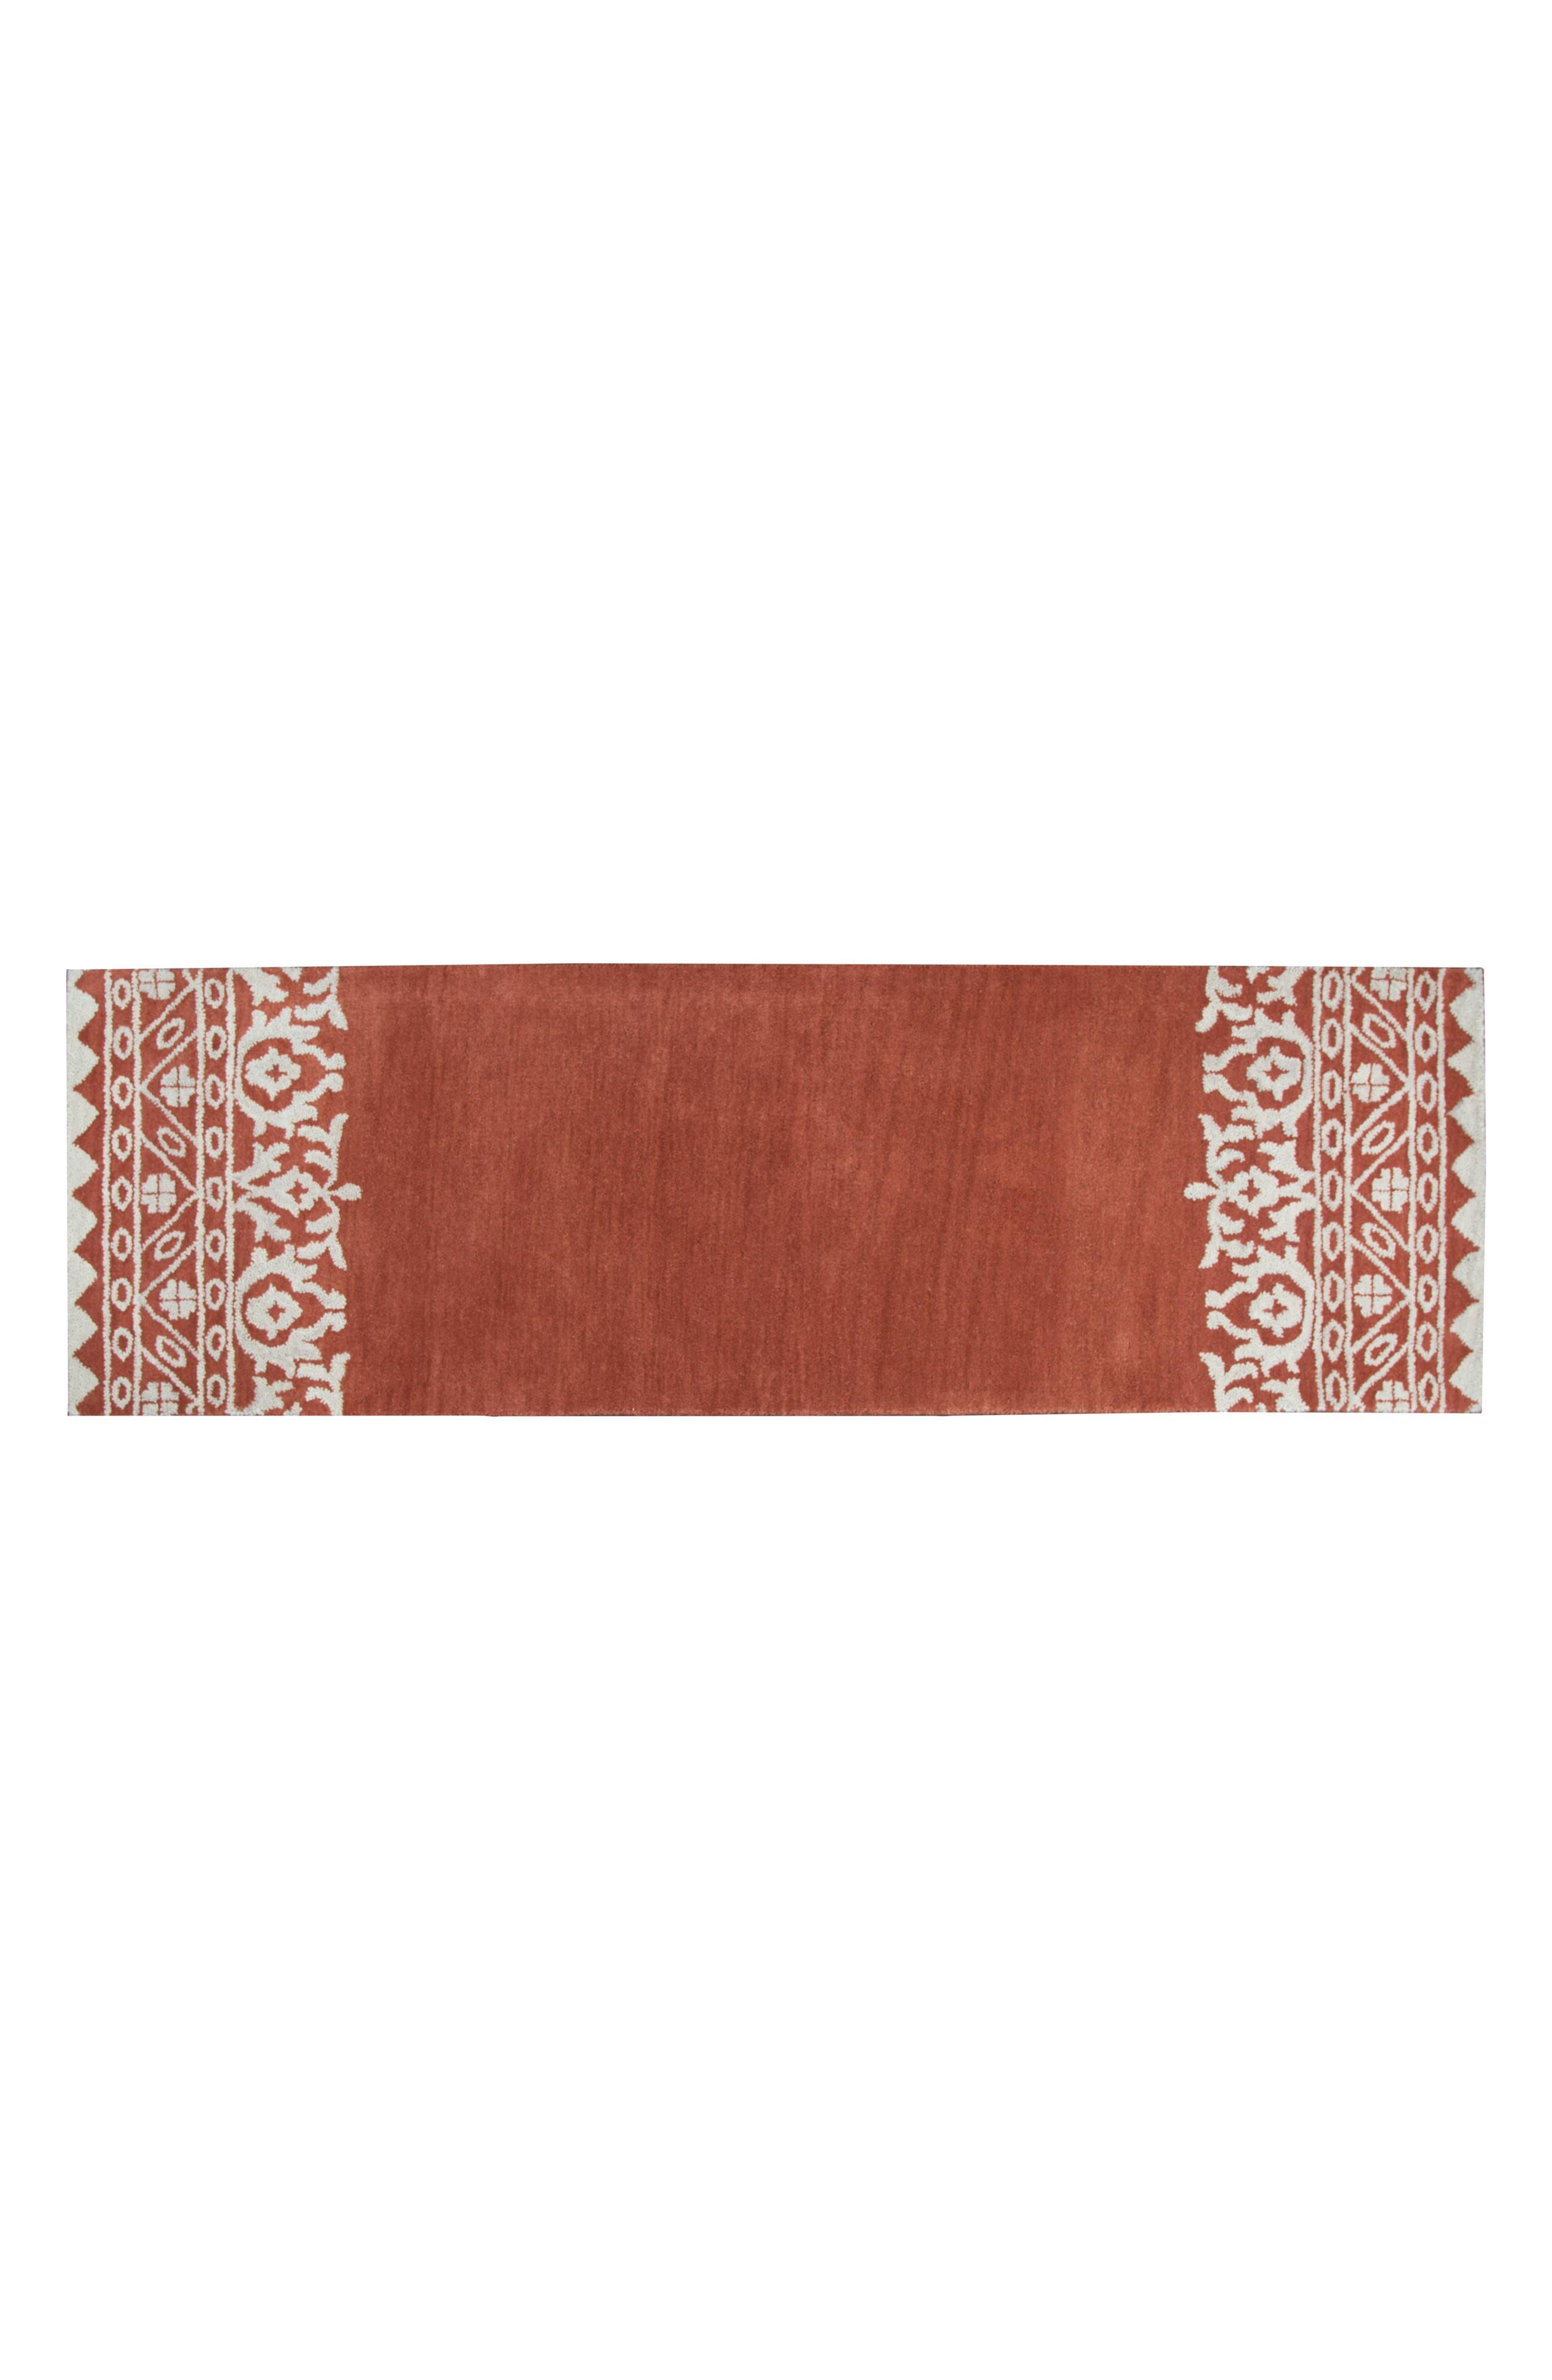 Framed Medallion Hand Tufted Wool Area Rug,                             Alternate thumbnail 12, color,